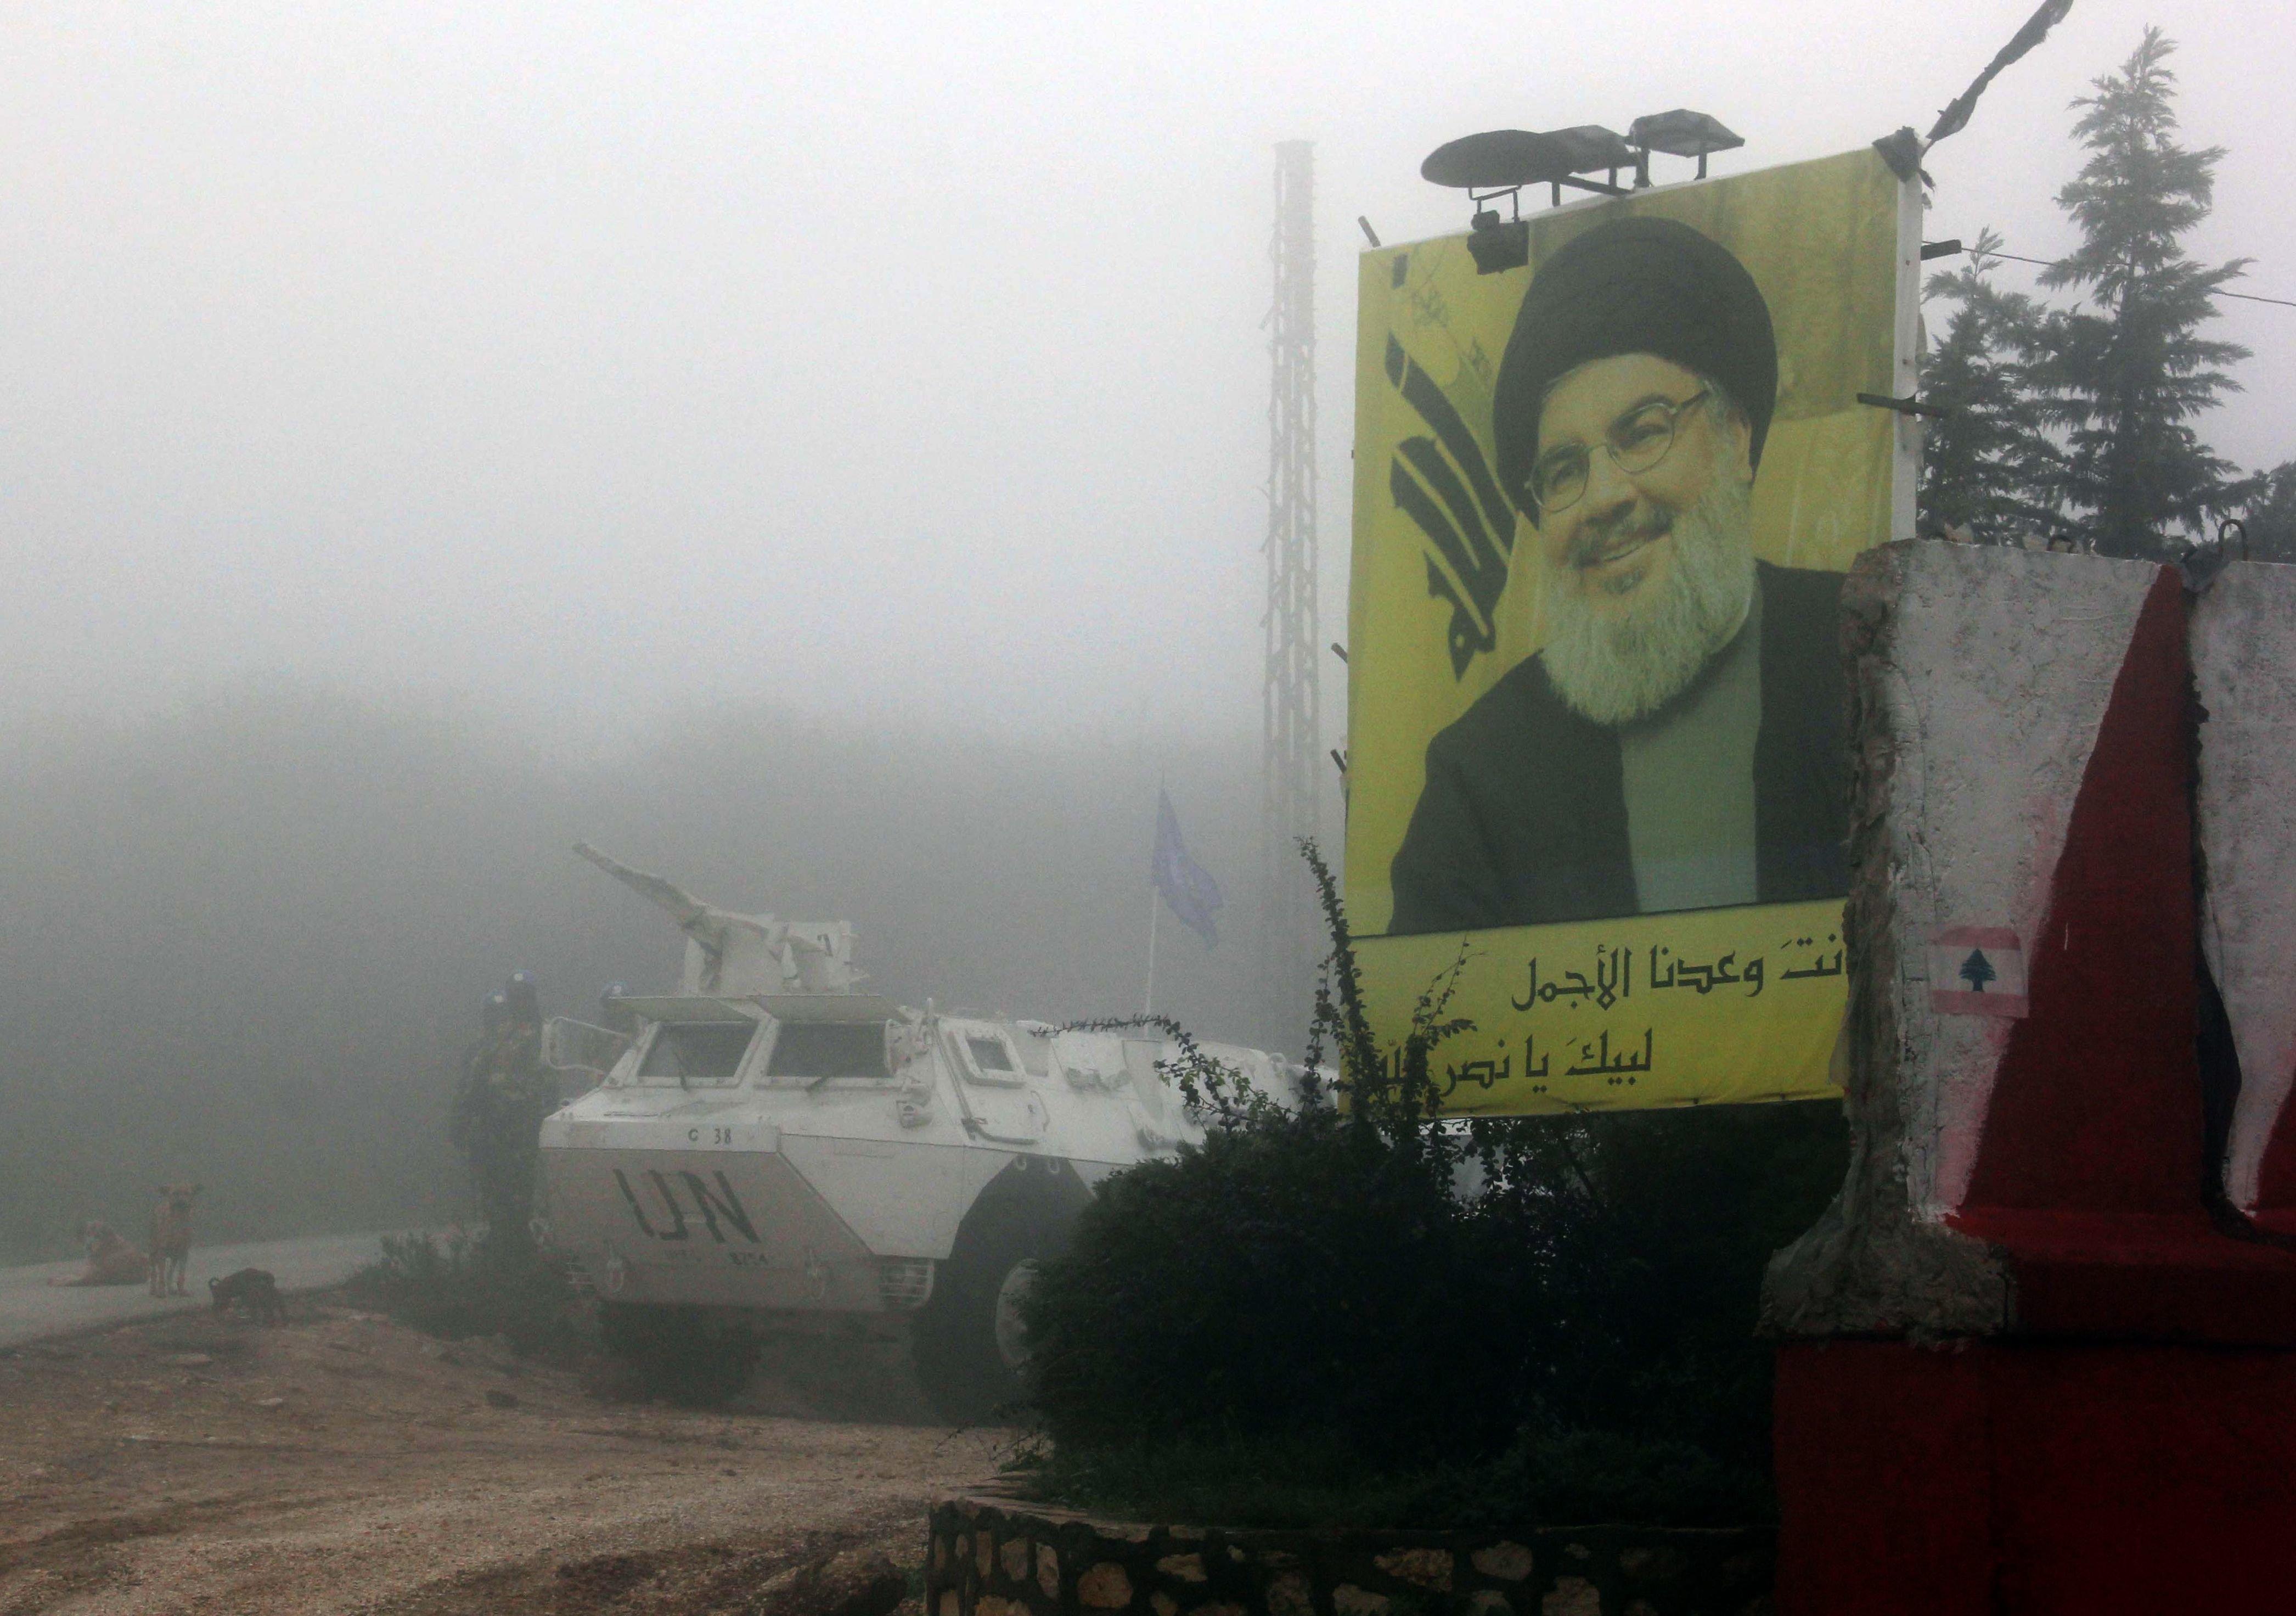 Le Hezbollahmenace: